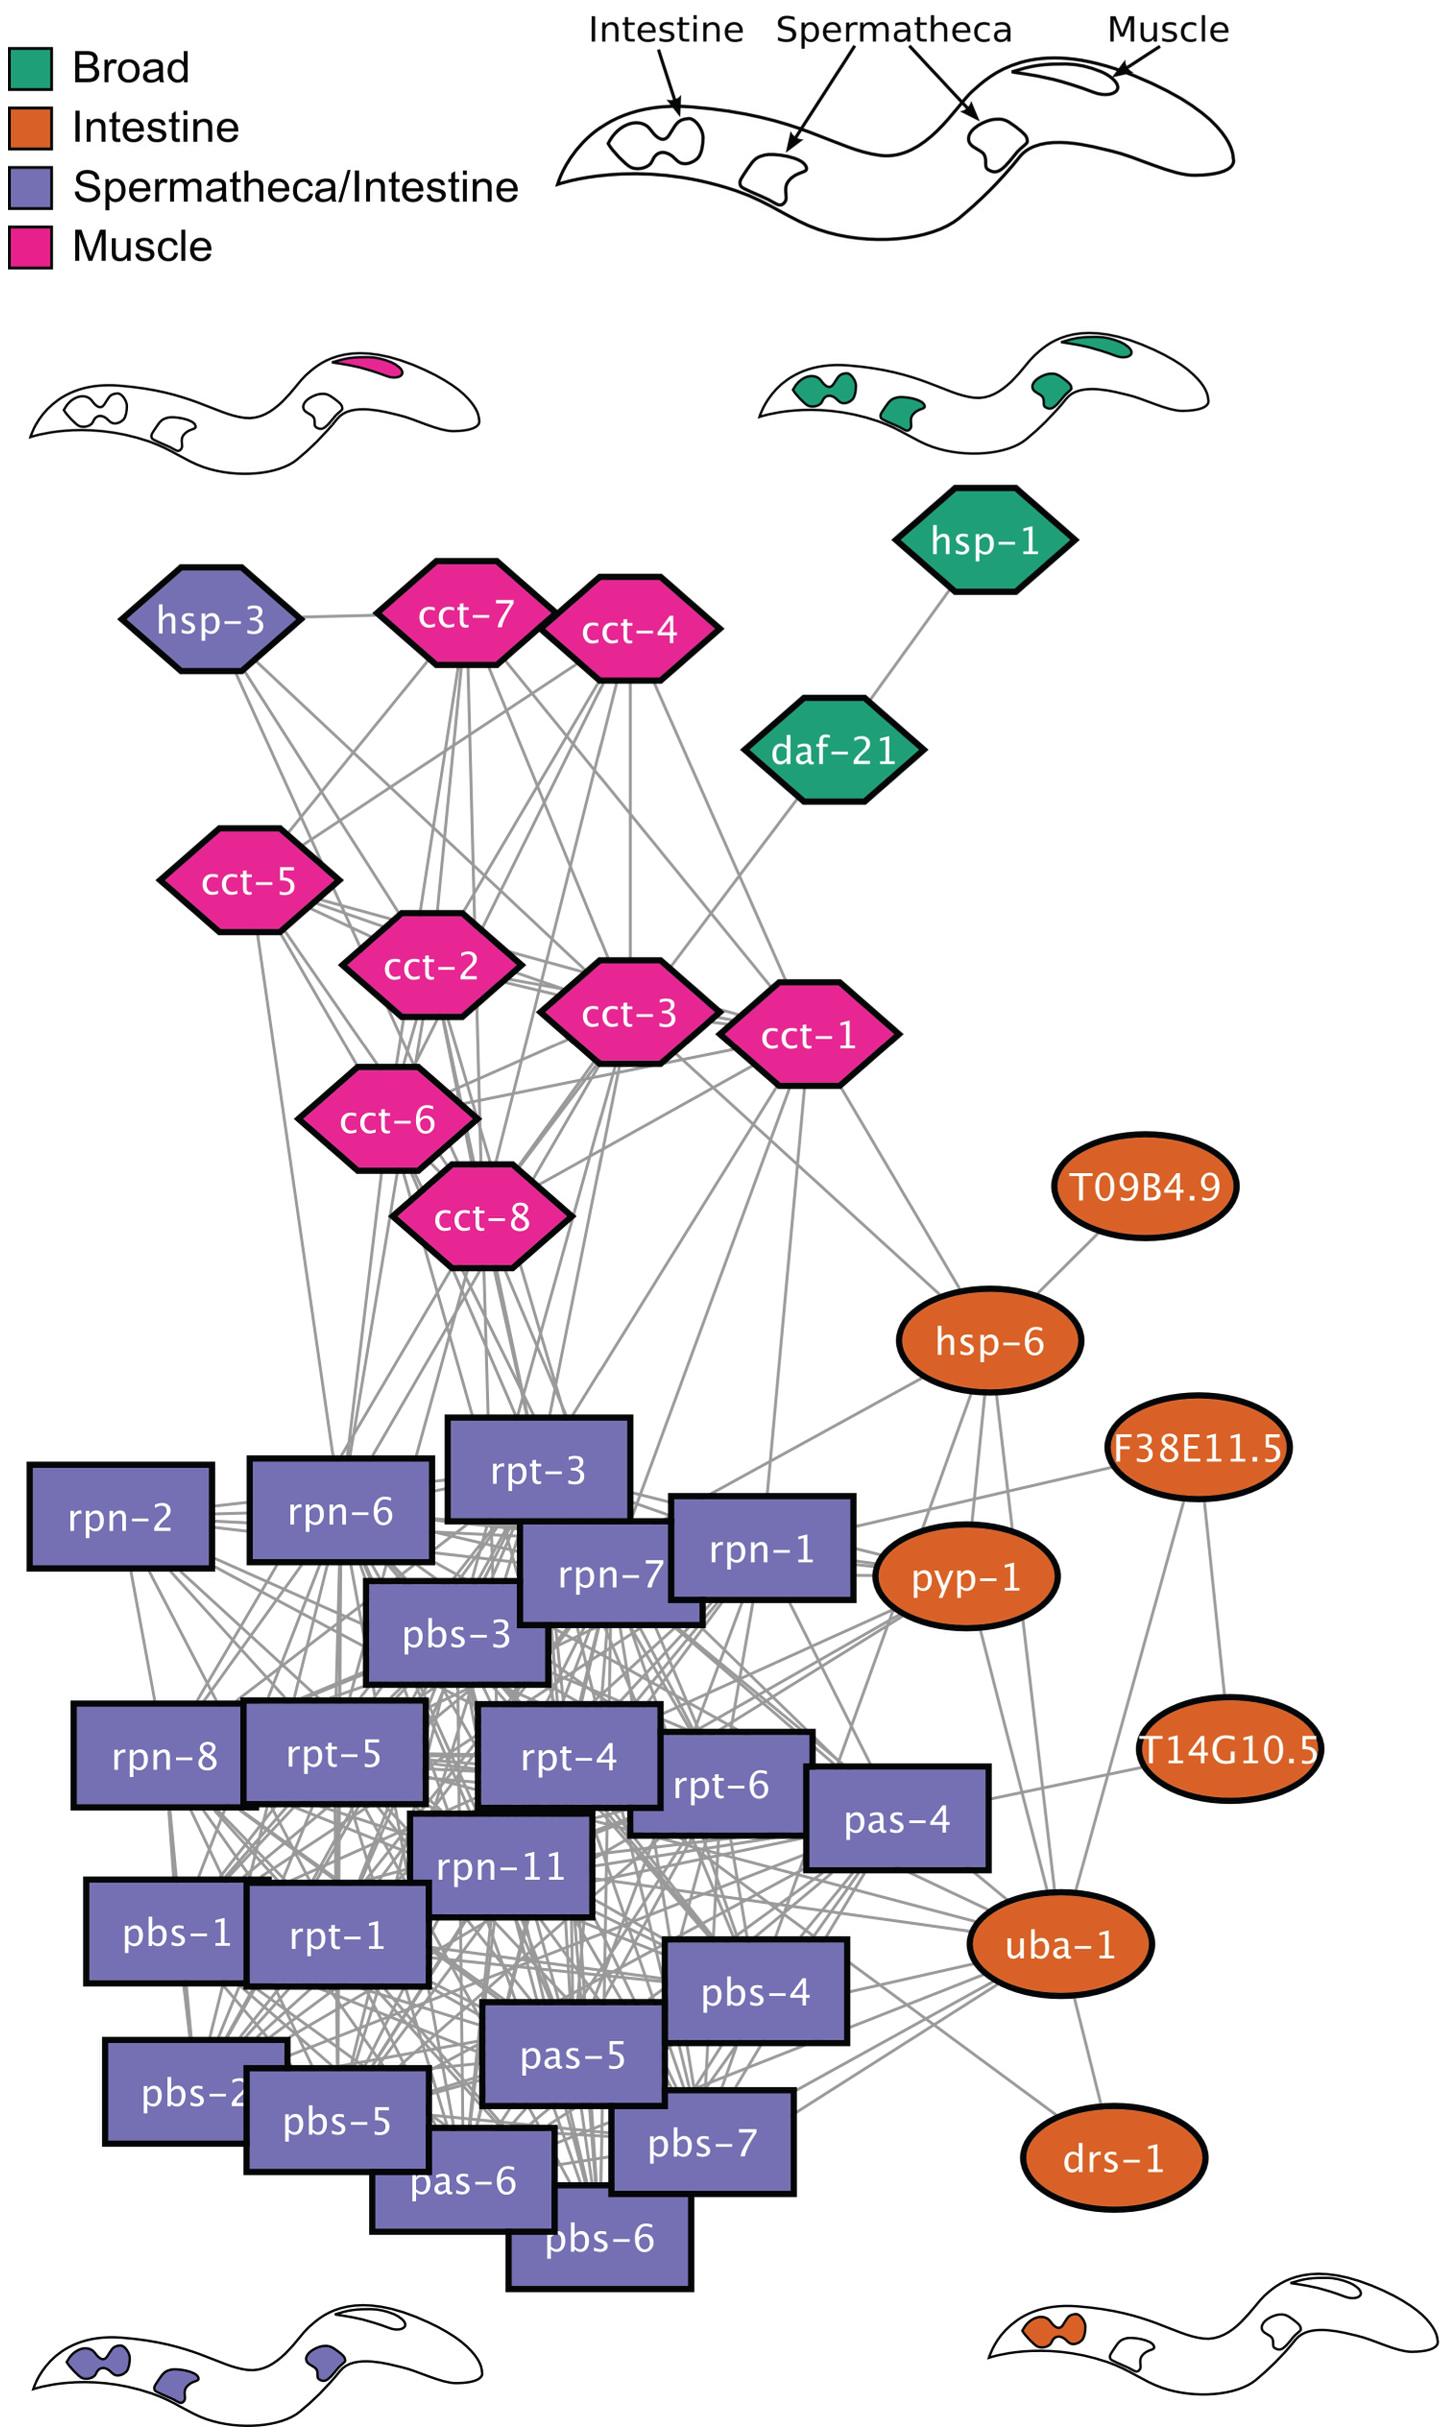 Network analysis of HSR regulators.